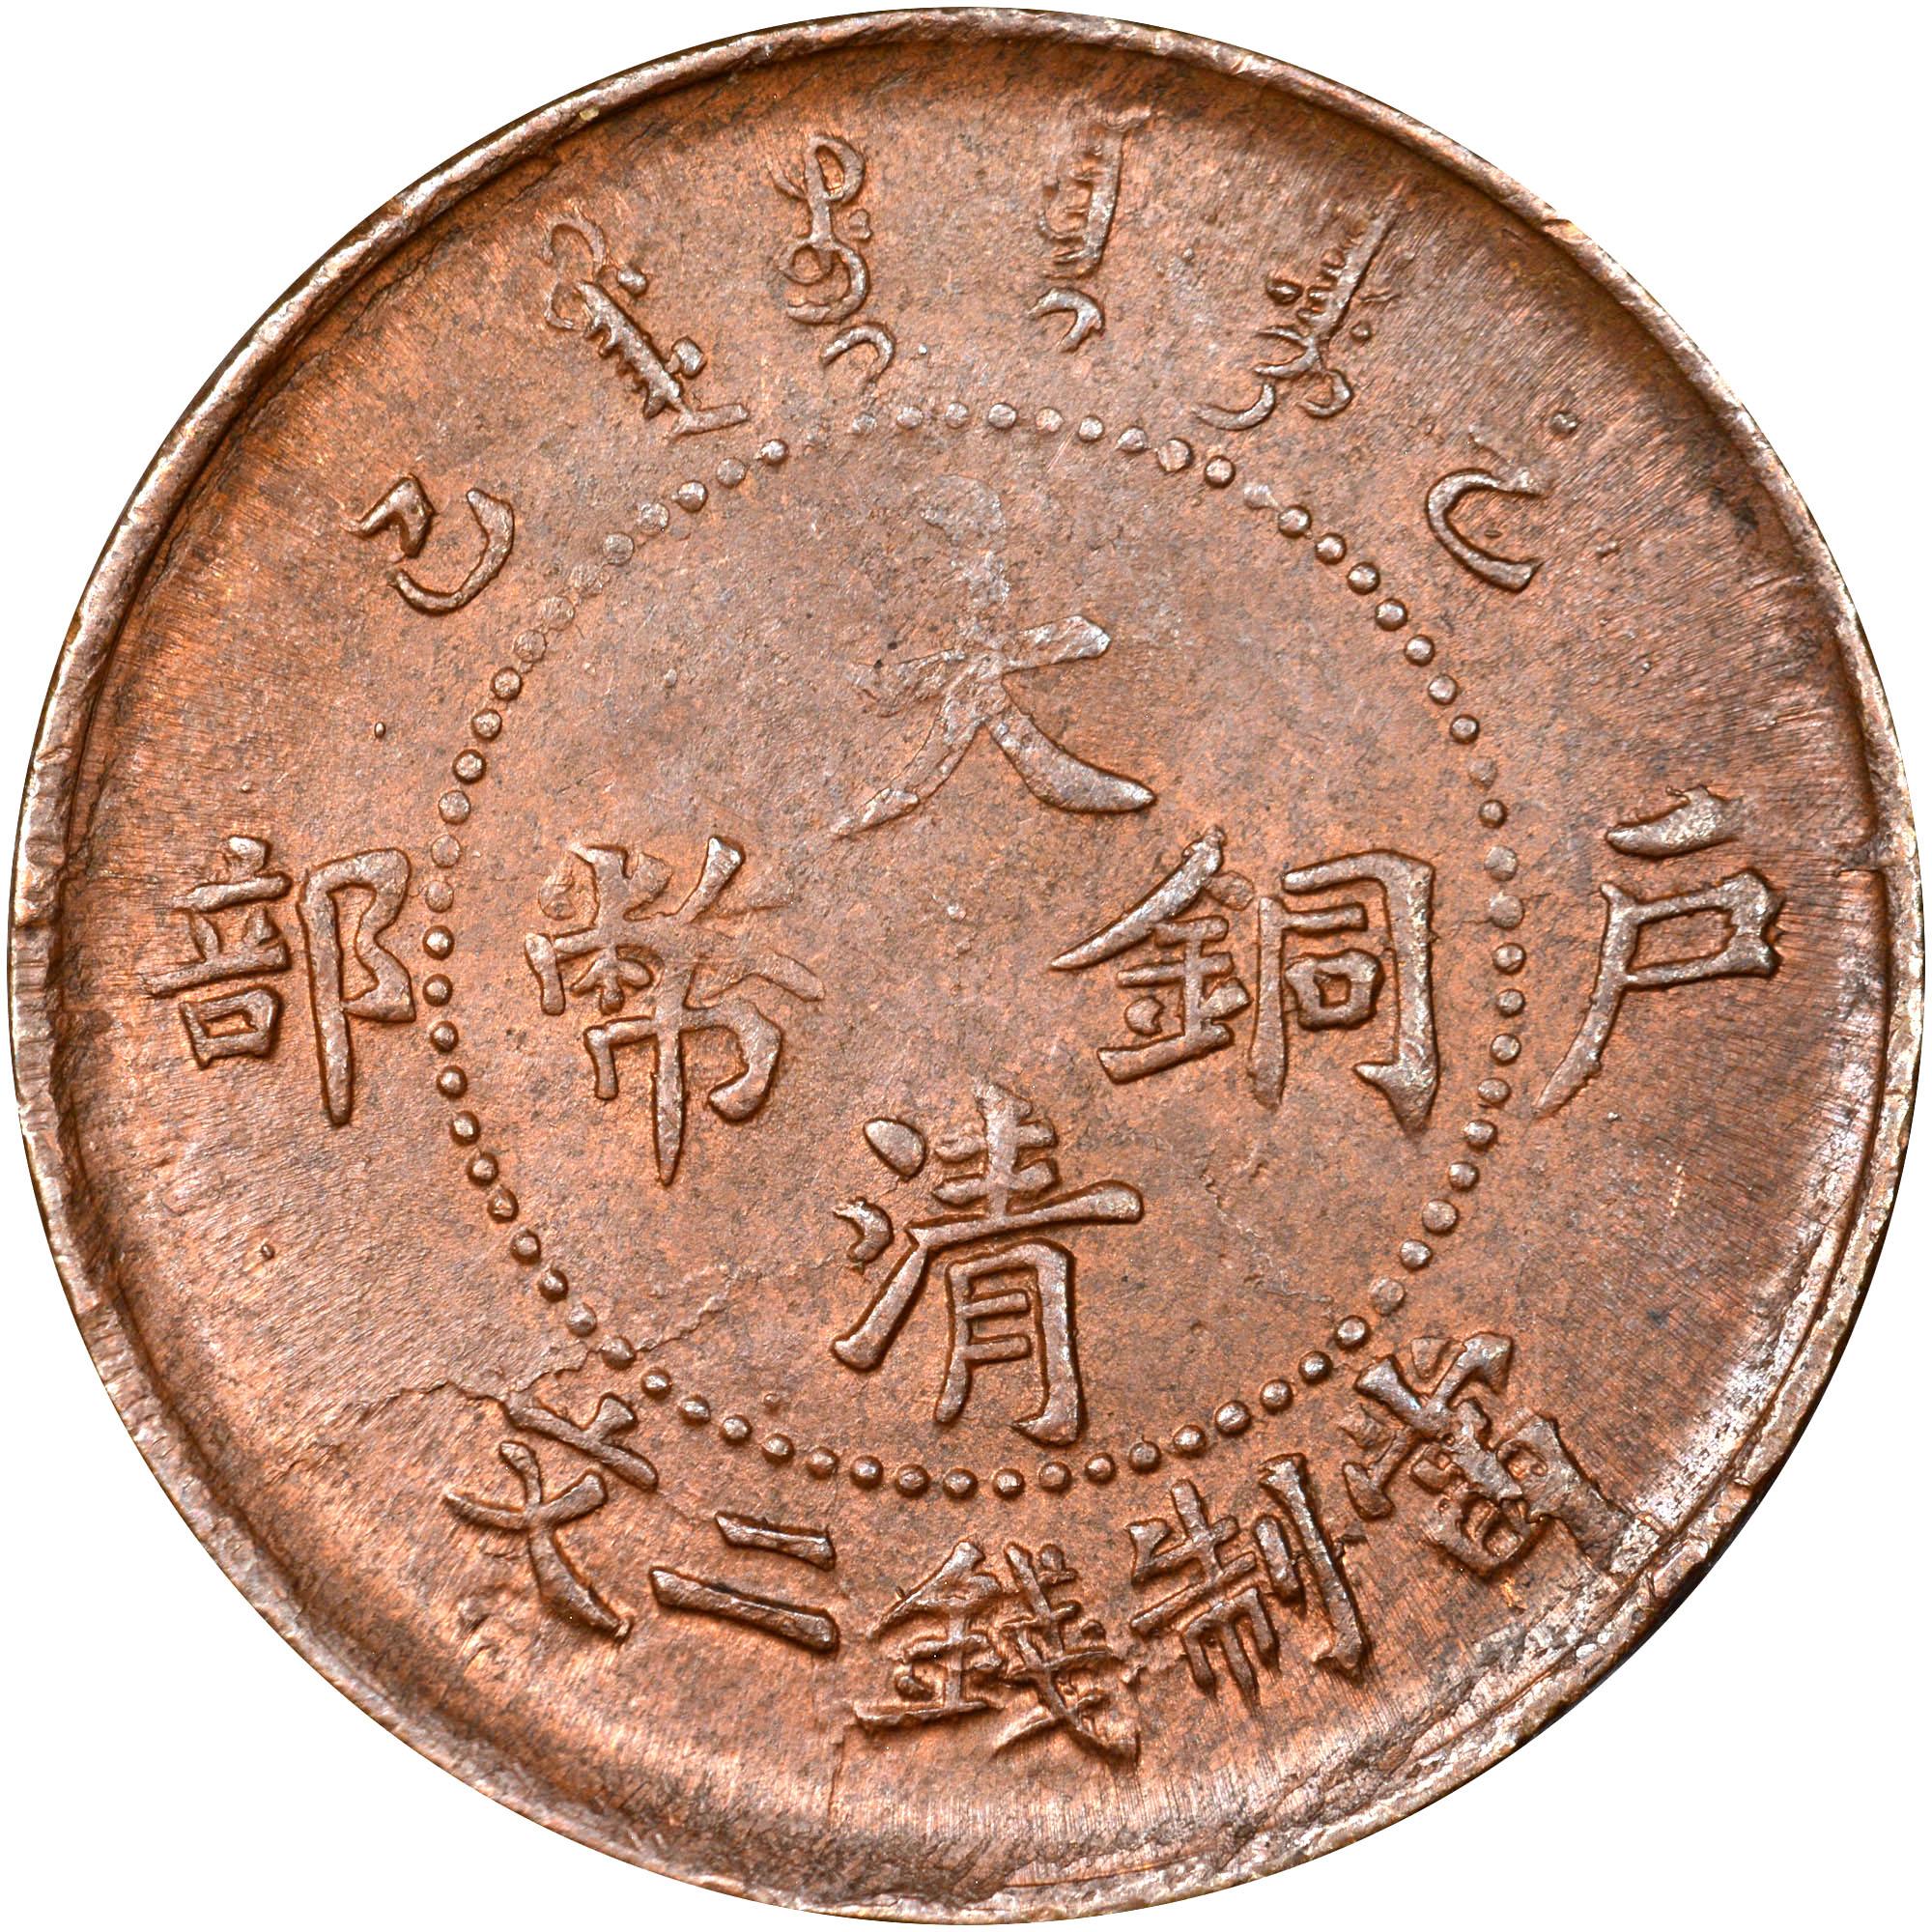 1905-1906 China EMPIRE 2 Cash obverse